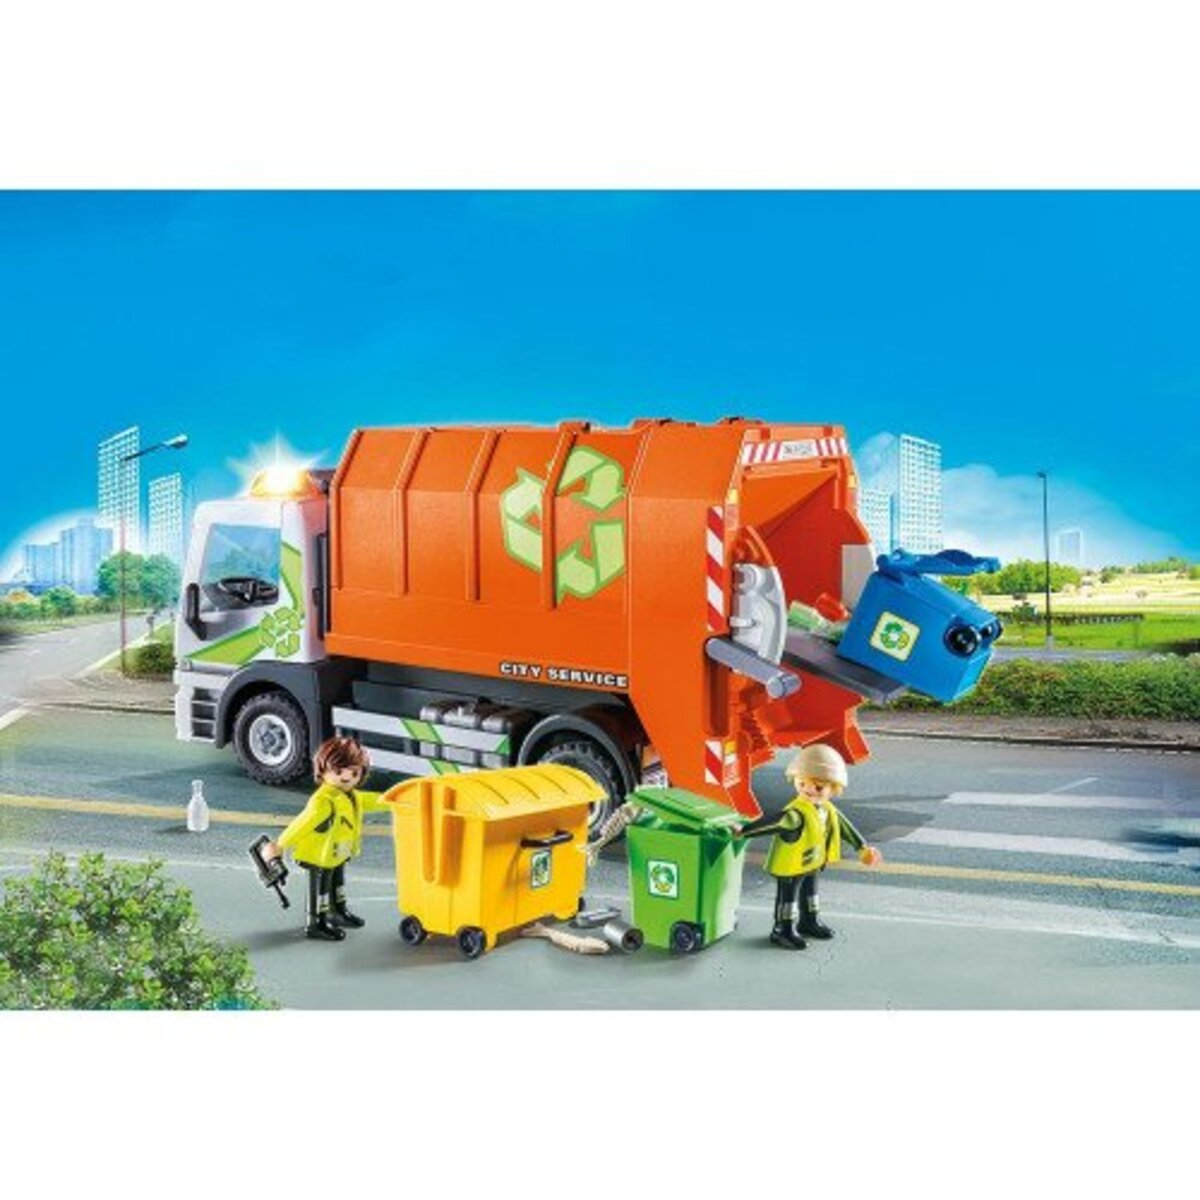 Bild 3 von PLAYMOBIL 70200 Müllfahrzeug